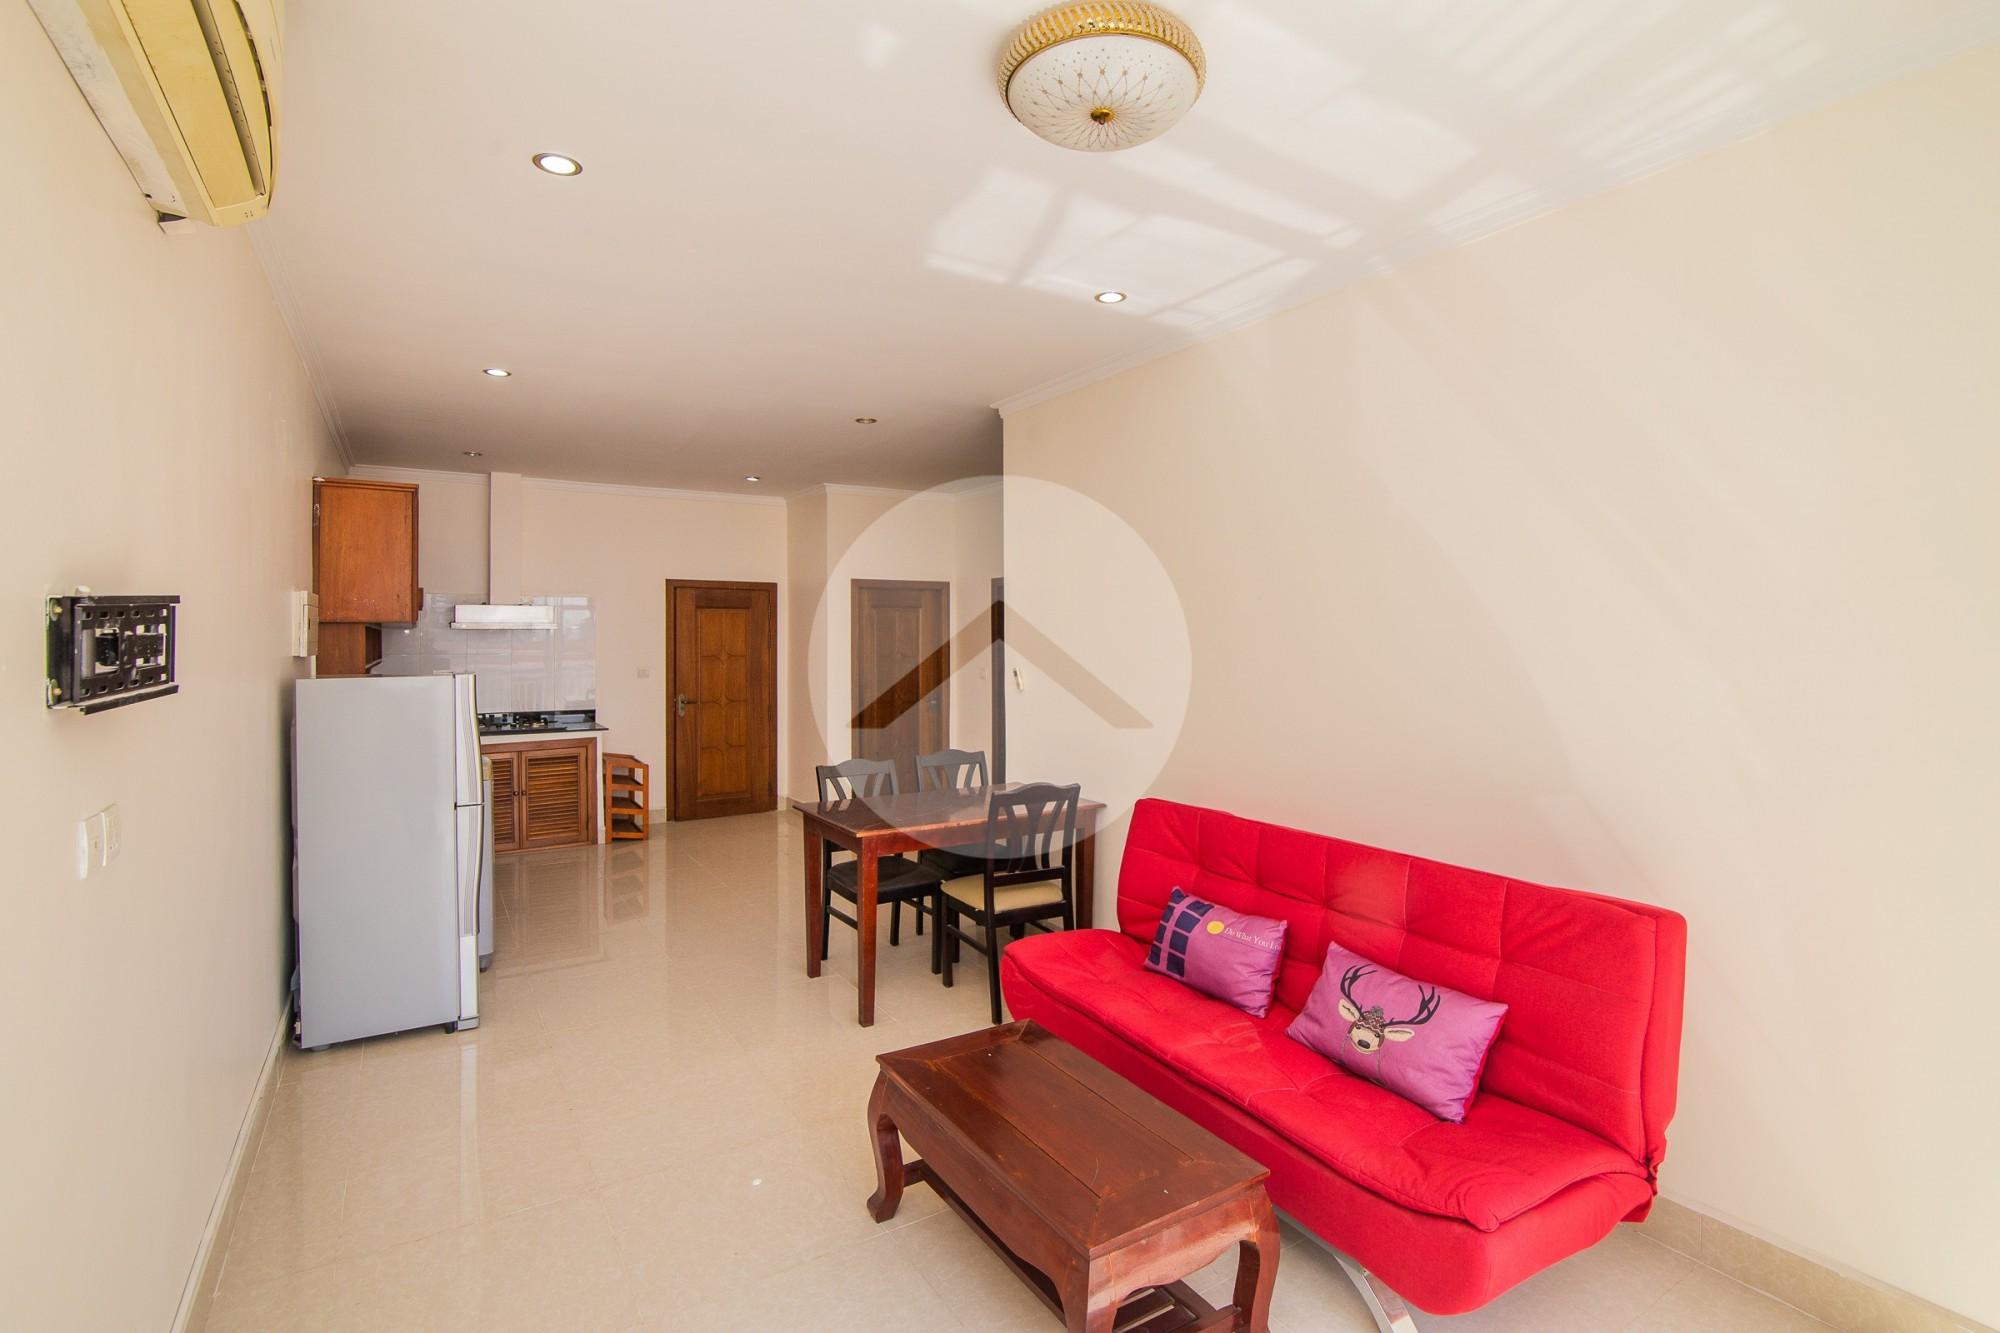 2 Bedroom Apartment For Rent - Tonle Bassac, Phnom Pen